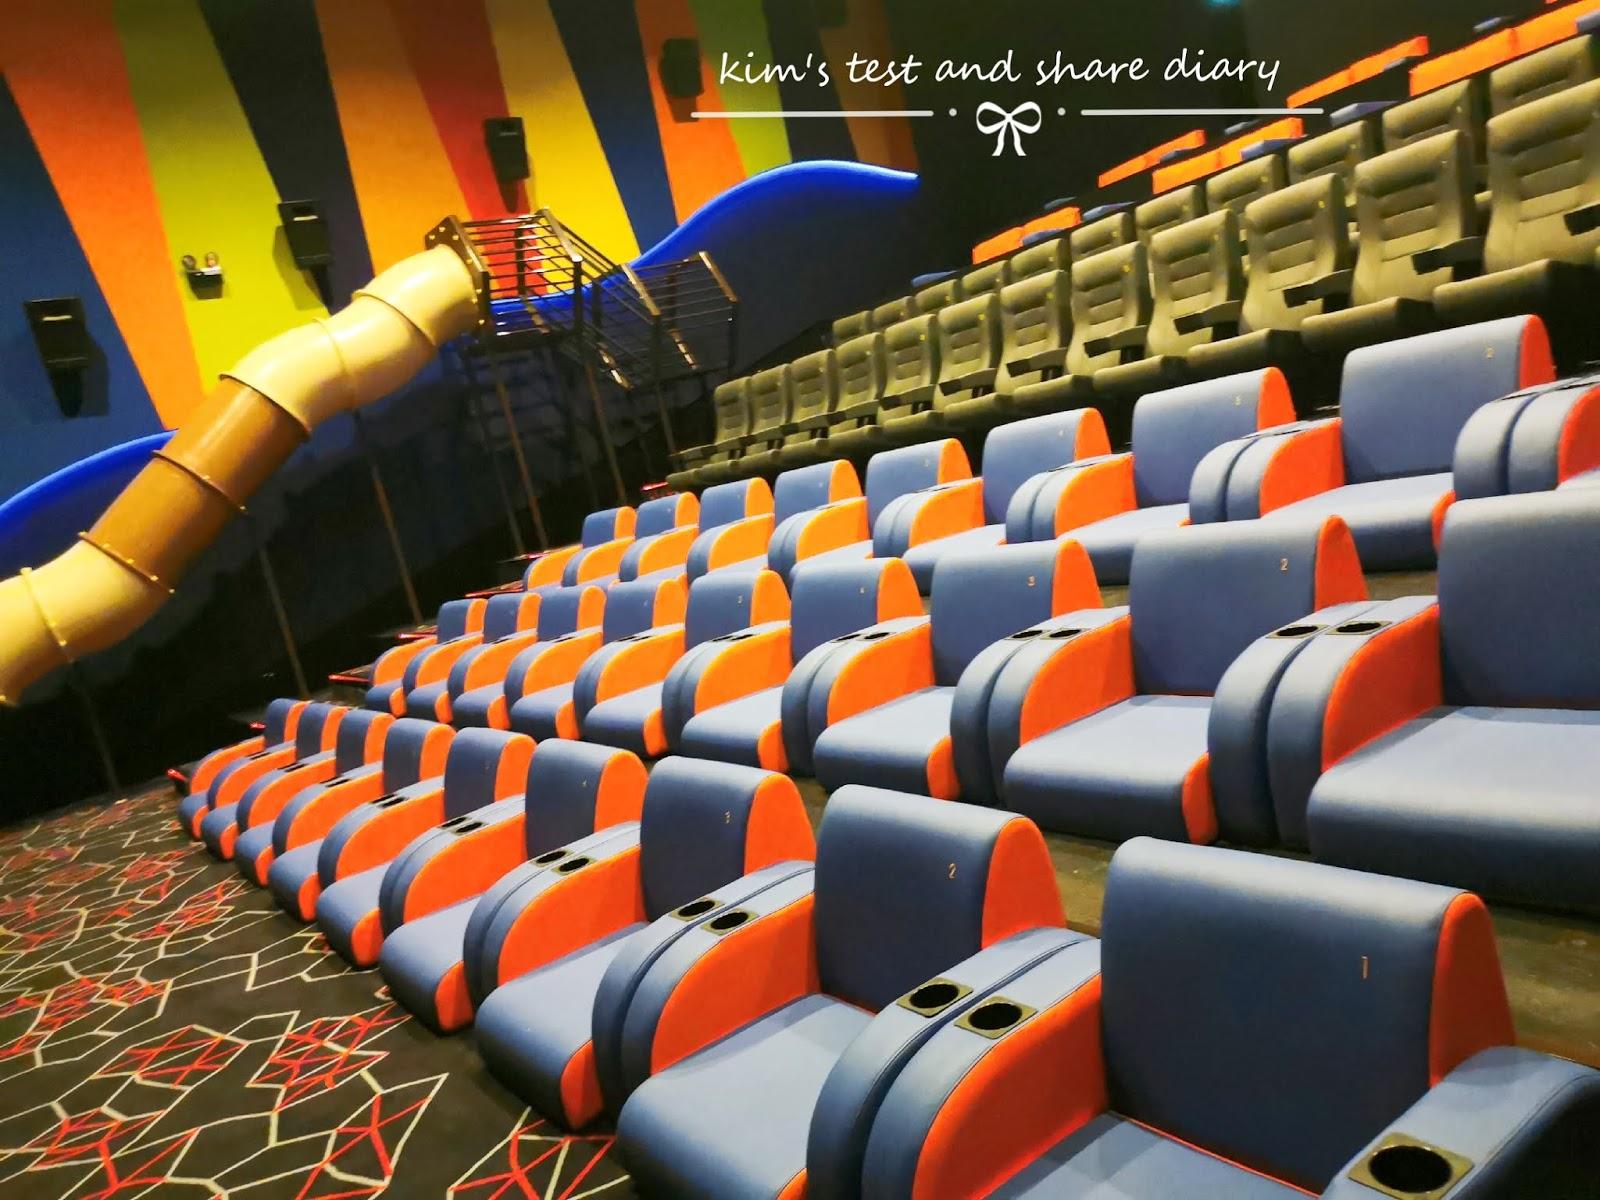 Kim S Test And Share Diary Mbo Cinemas Entered Aeon Bandar Dato